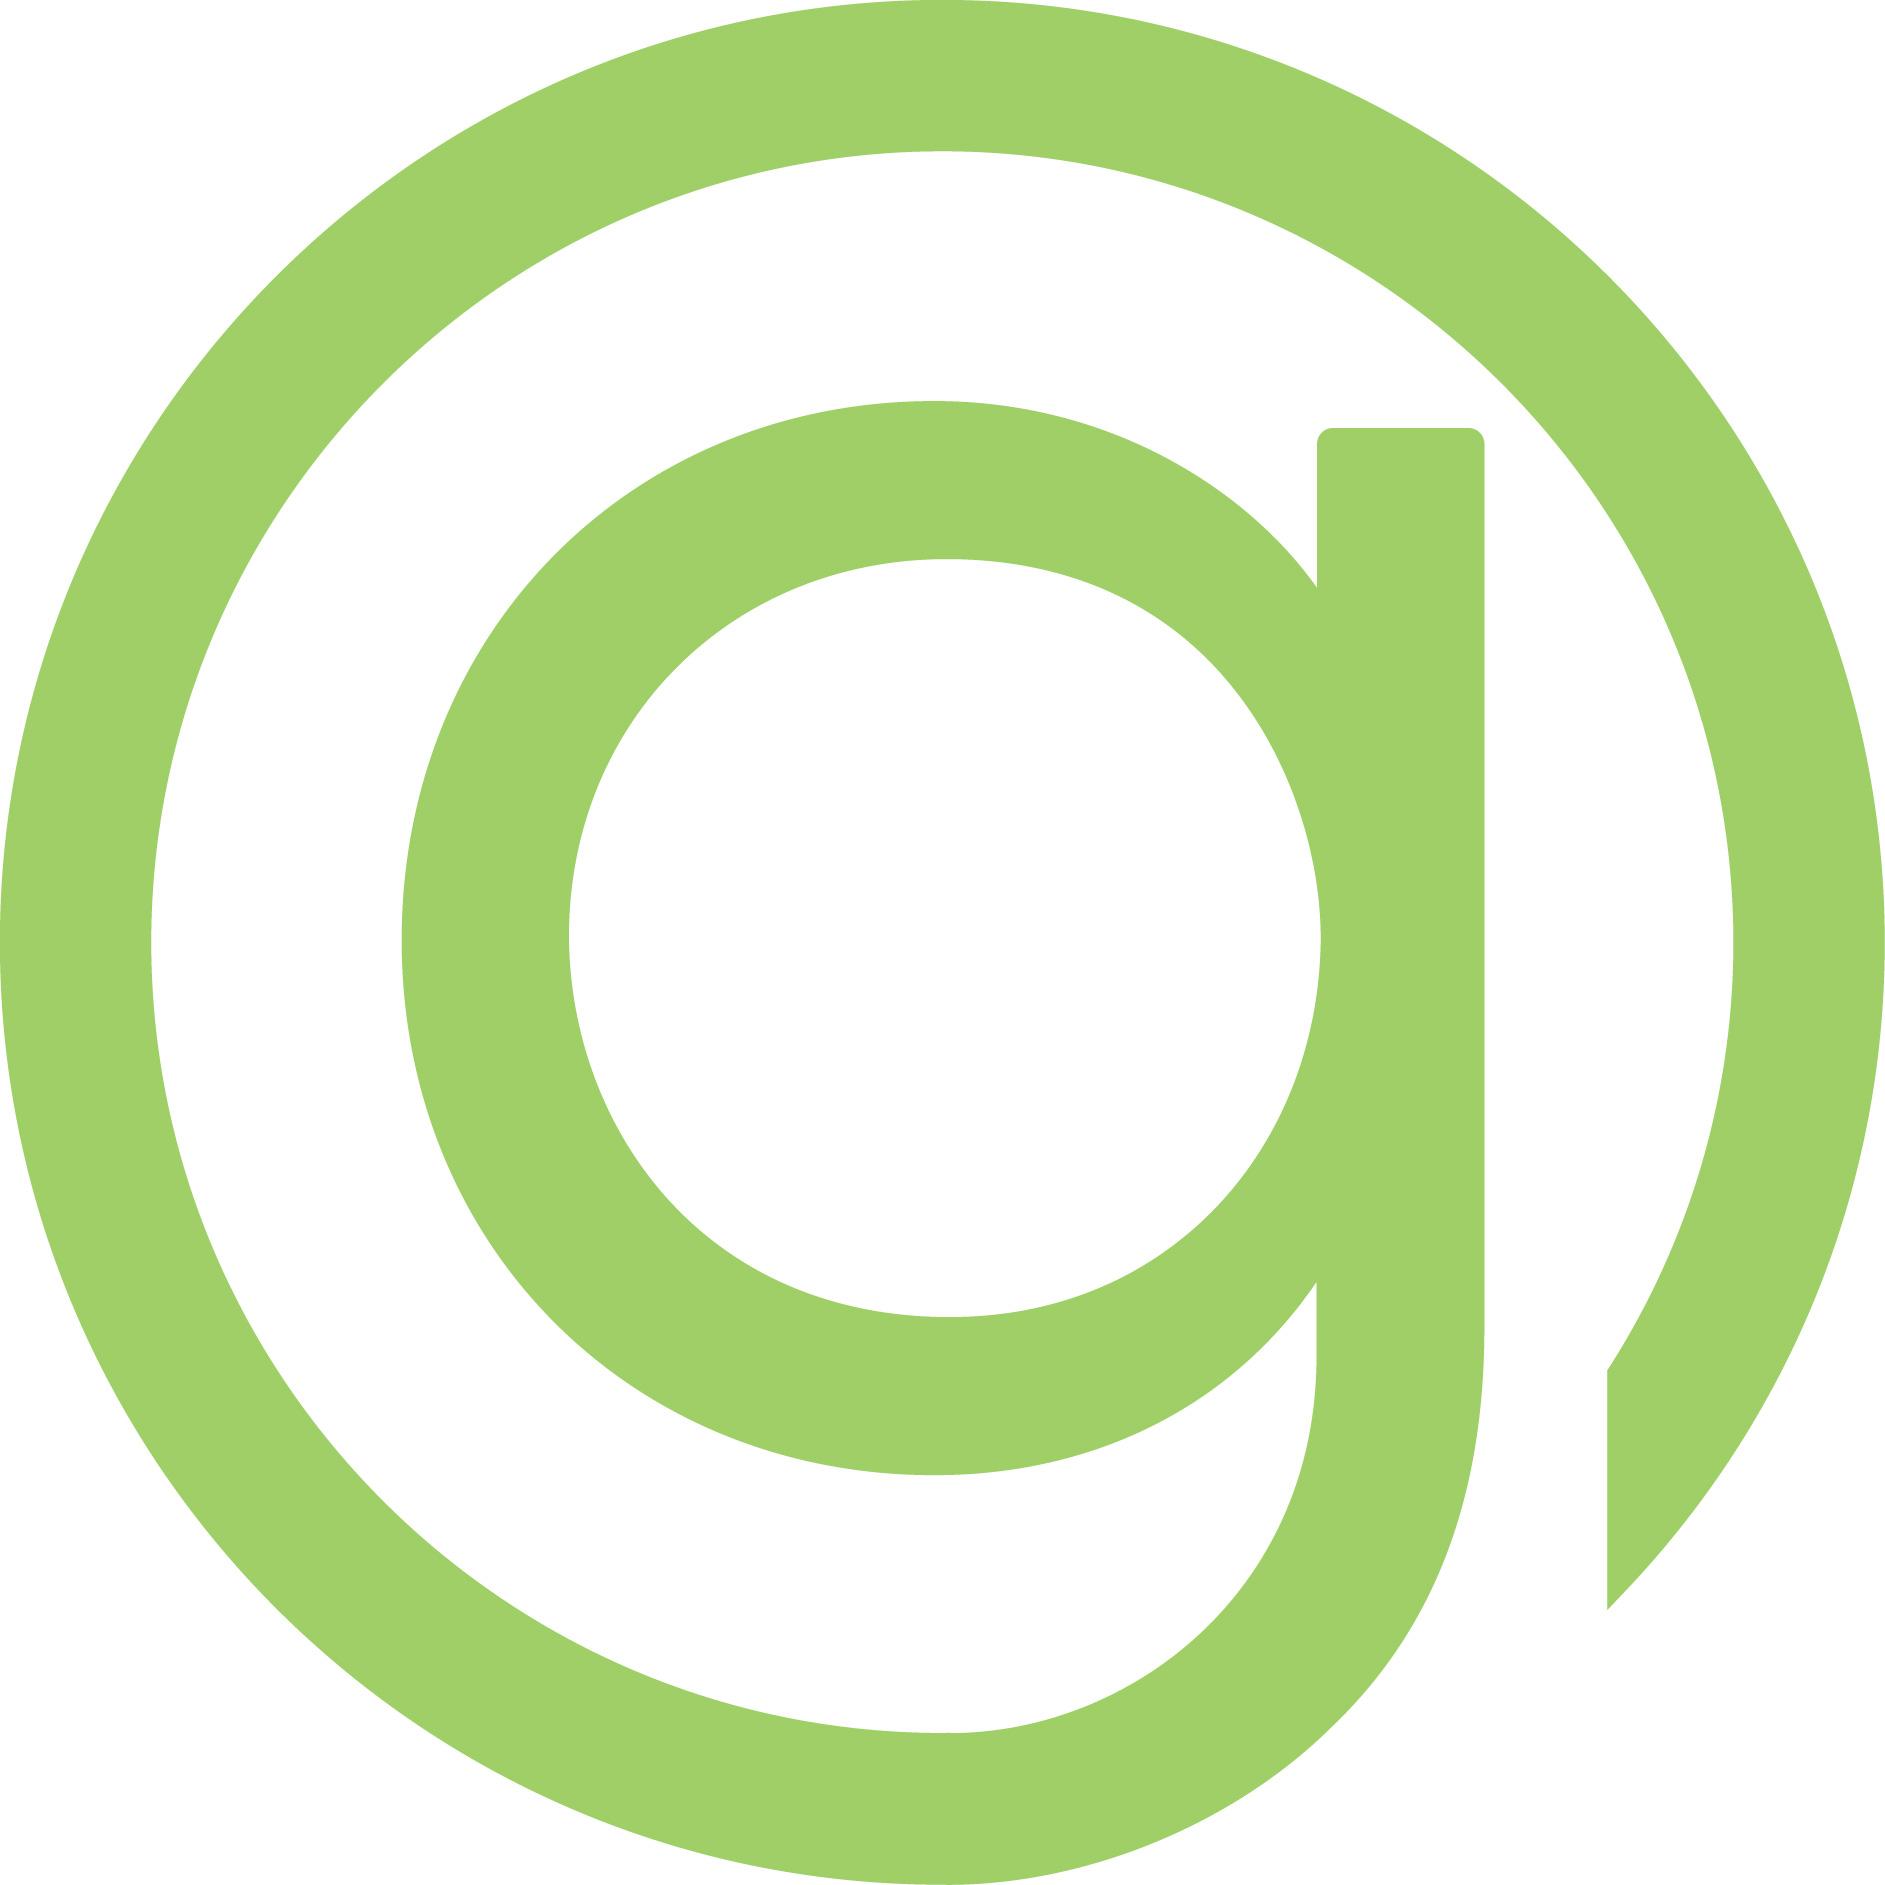 Greenlight Marketing on LogoLounge